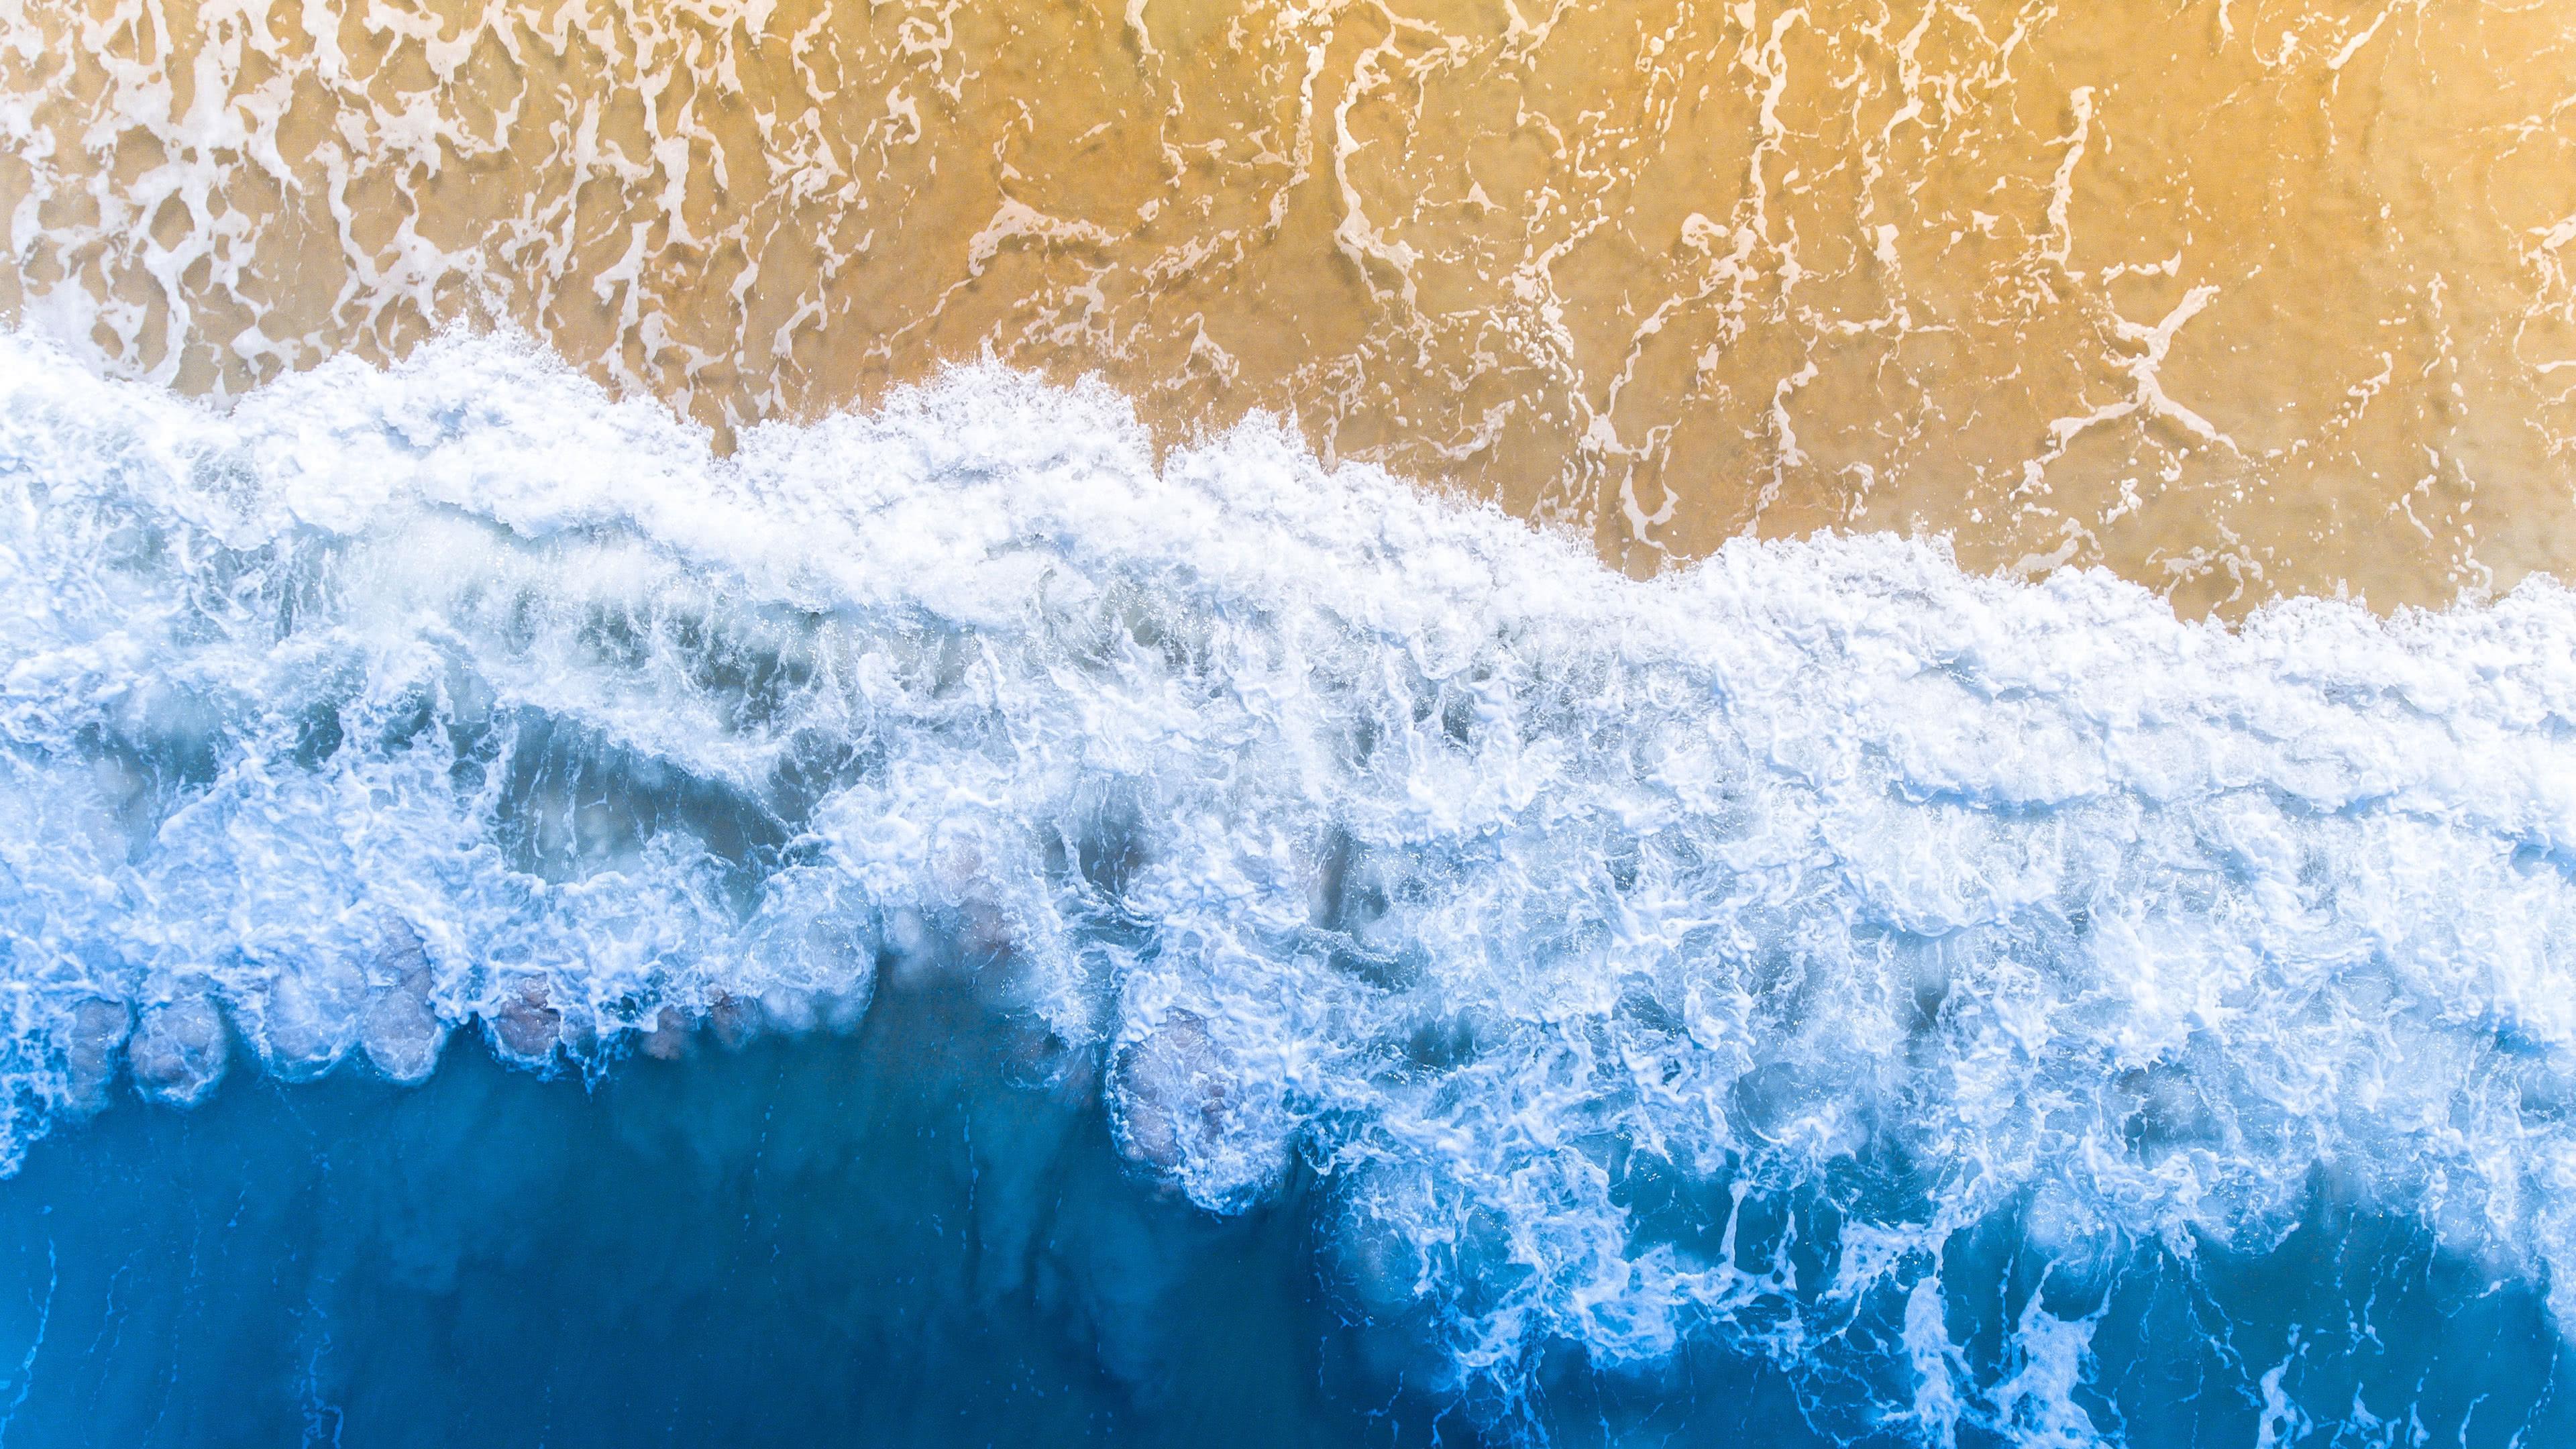 ocean sand beach uhd 4k wallpaper